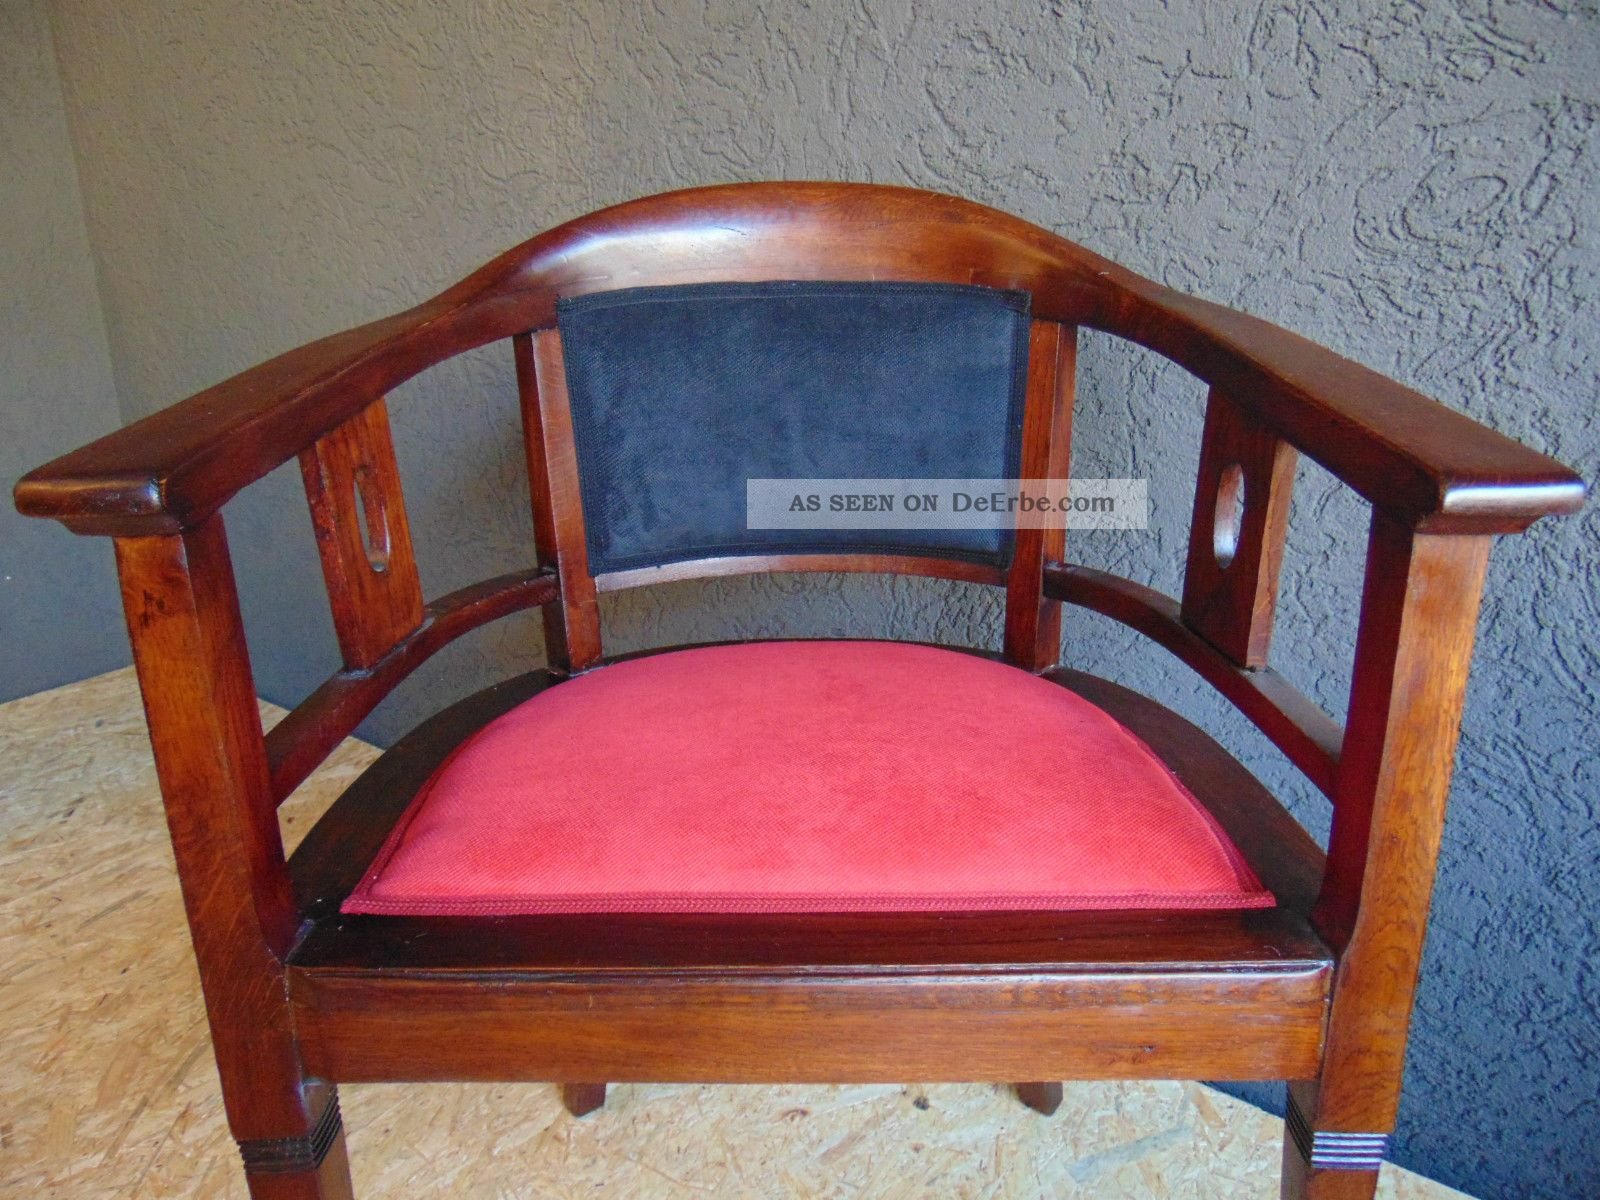 Top Jugendstil Armlehnstuhl Um 1910 Eiche Stuhl